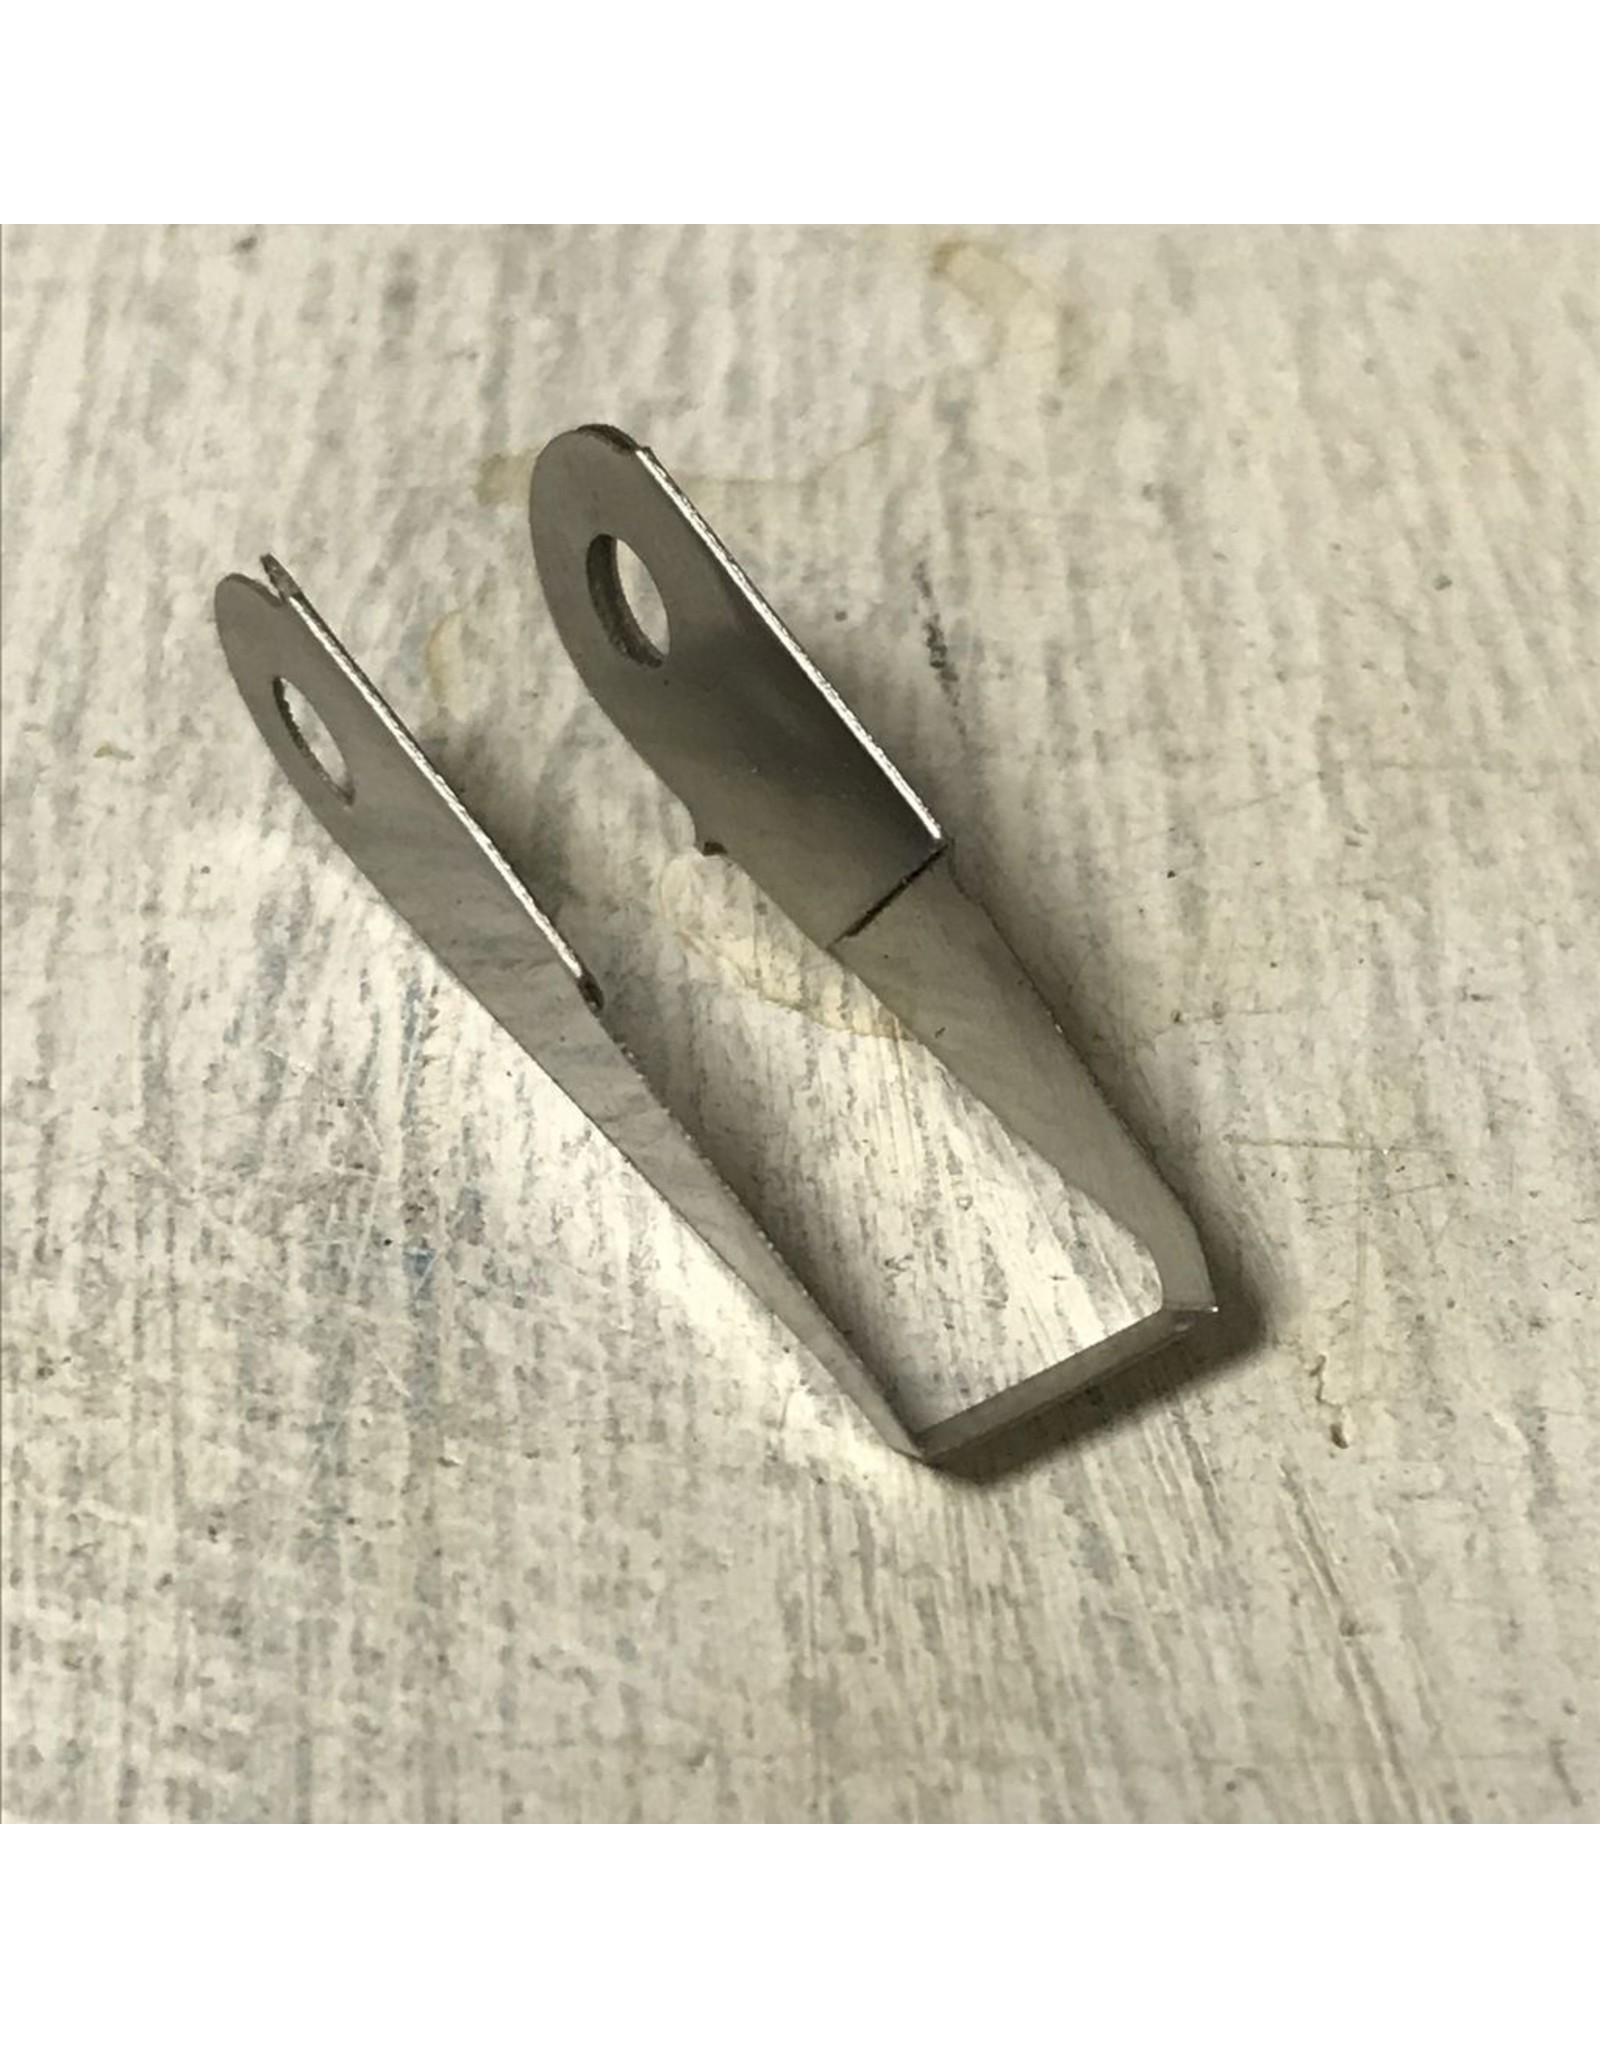 Diamond Core Tools 1 x Spare Large Square-tip Carver Blade